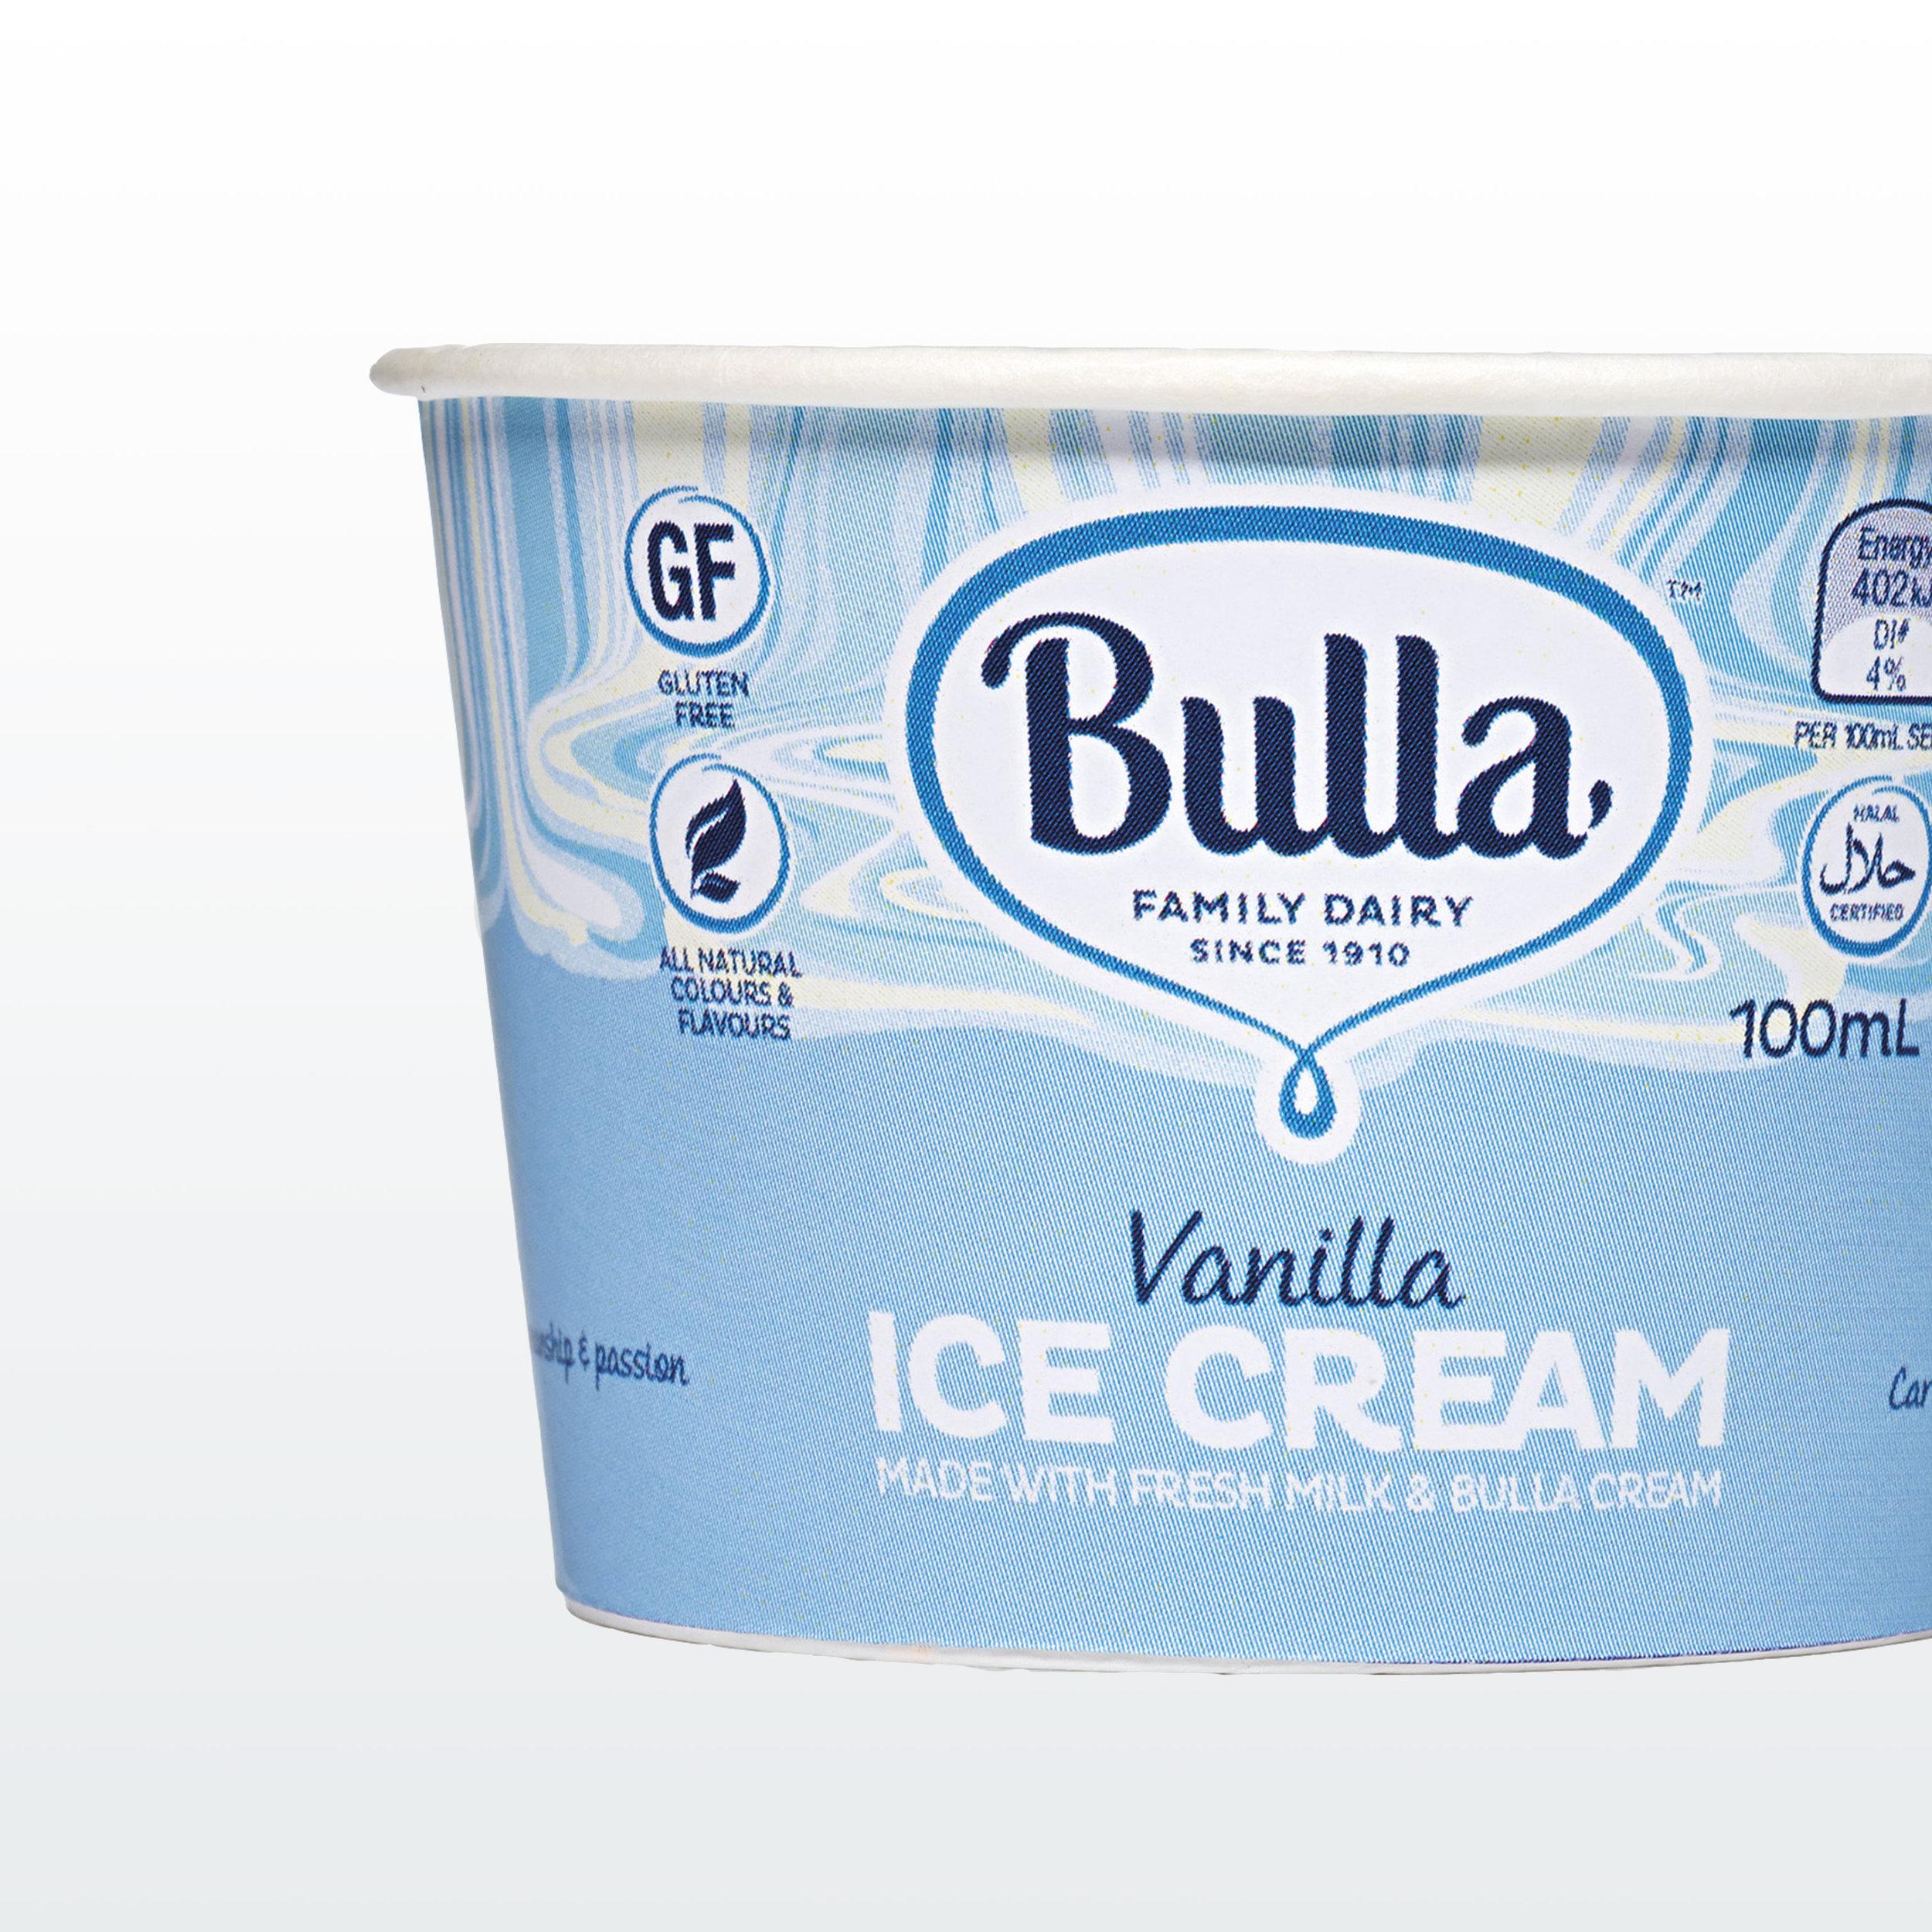 Bulla ice cream